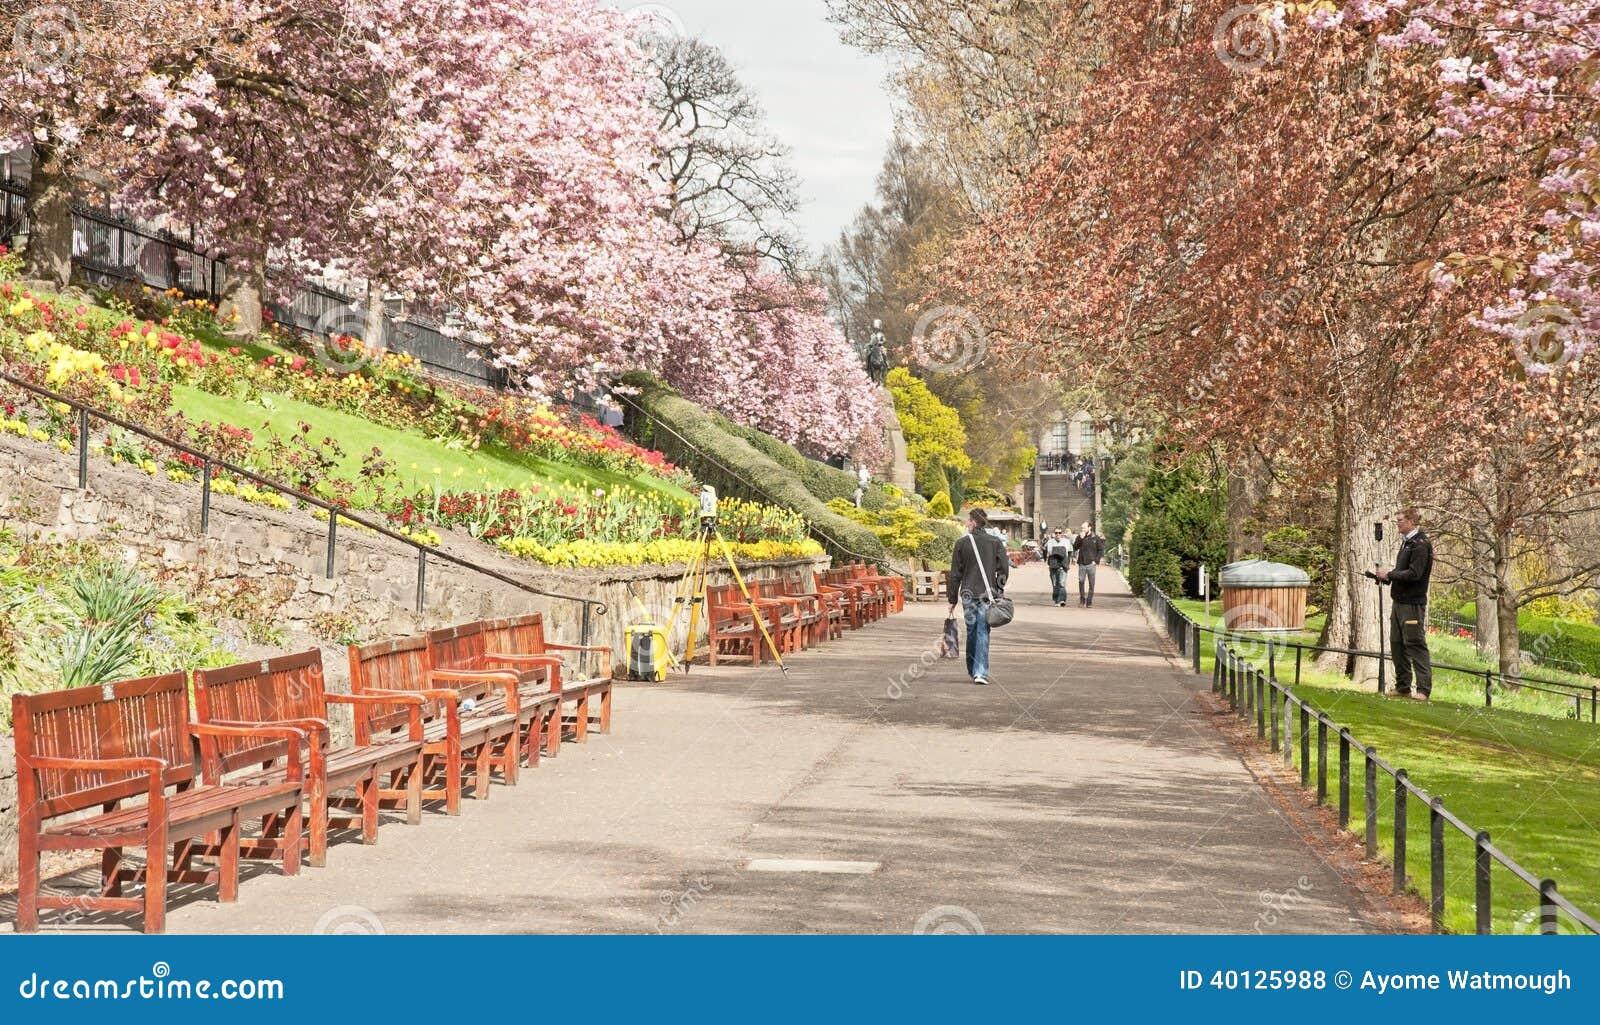 In princes street gardens edinburgh in spring time mr no pr no 2 395 2